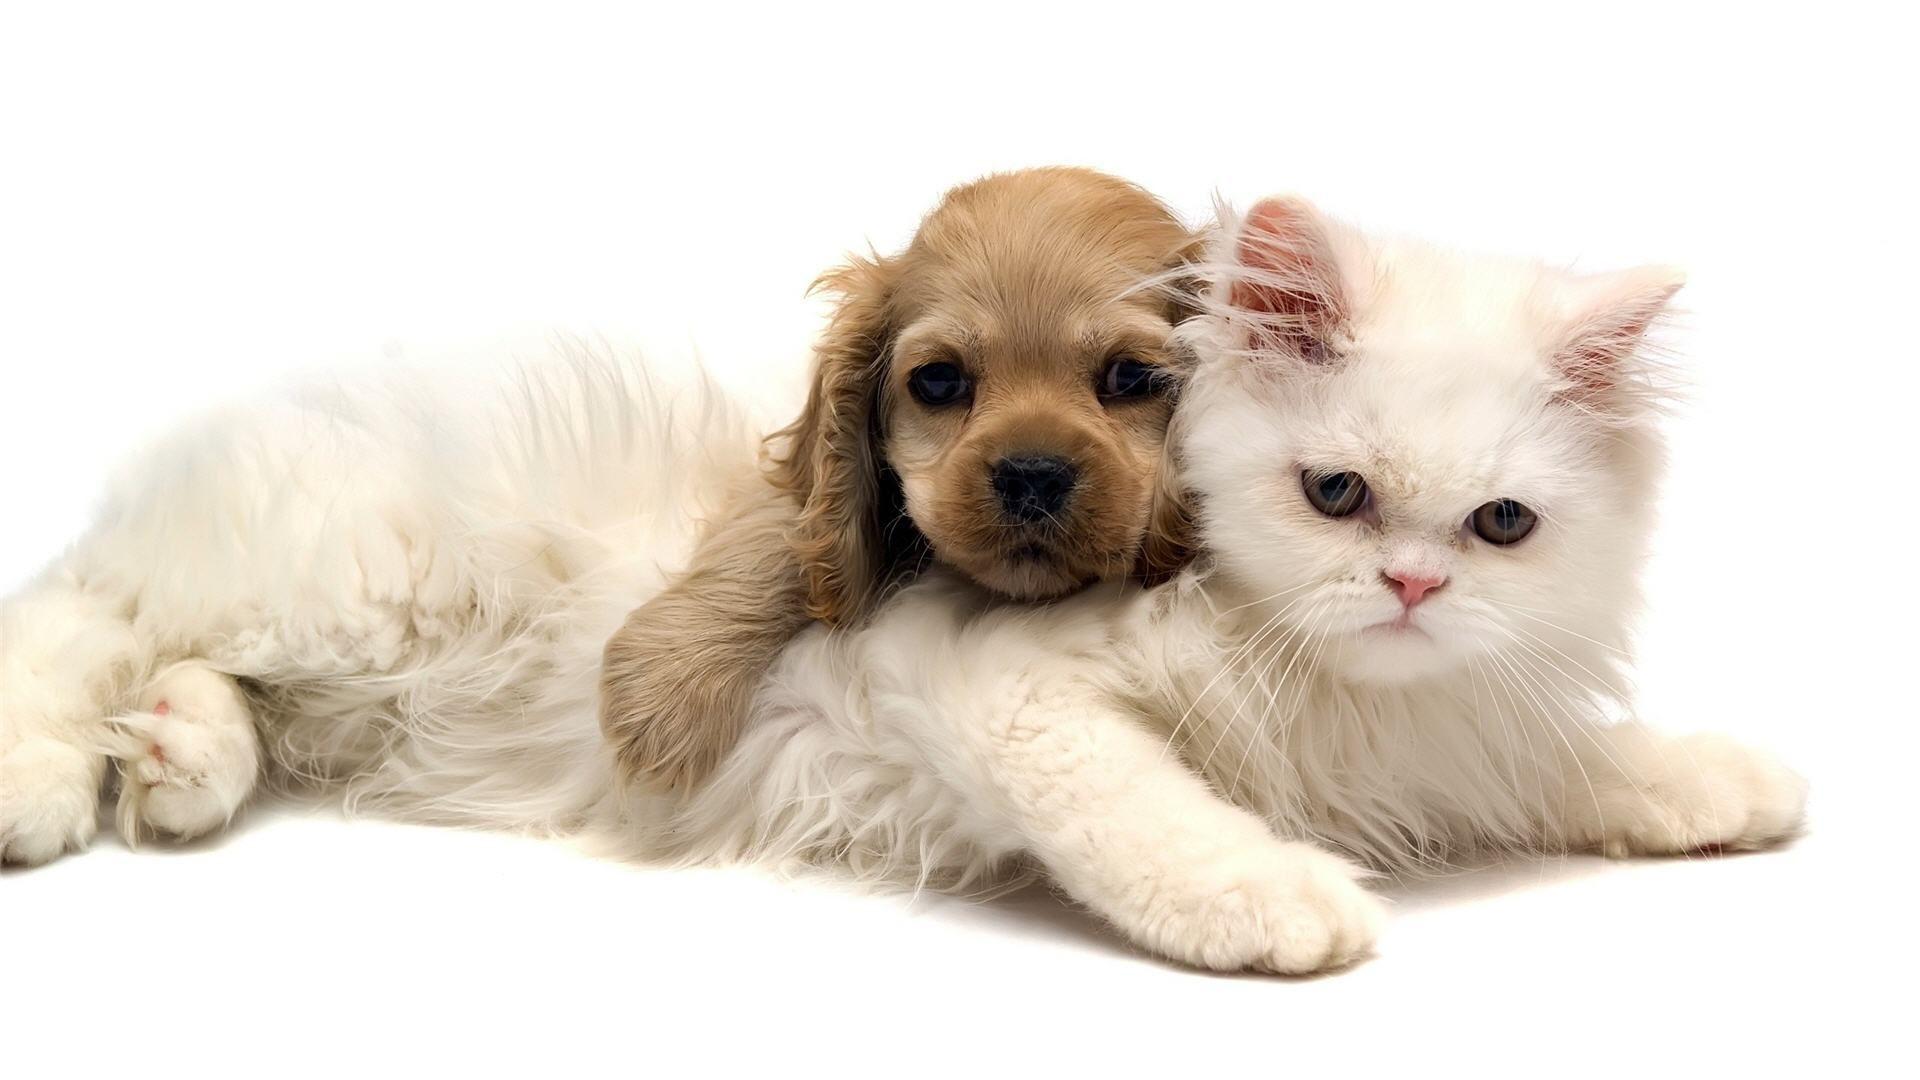 Fantastic Cute Dog N Cat Wallpapers - 07da498a8c0b93777d94bd971a5da152  Best Photo Reference_846048 .jpg